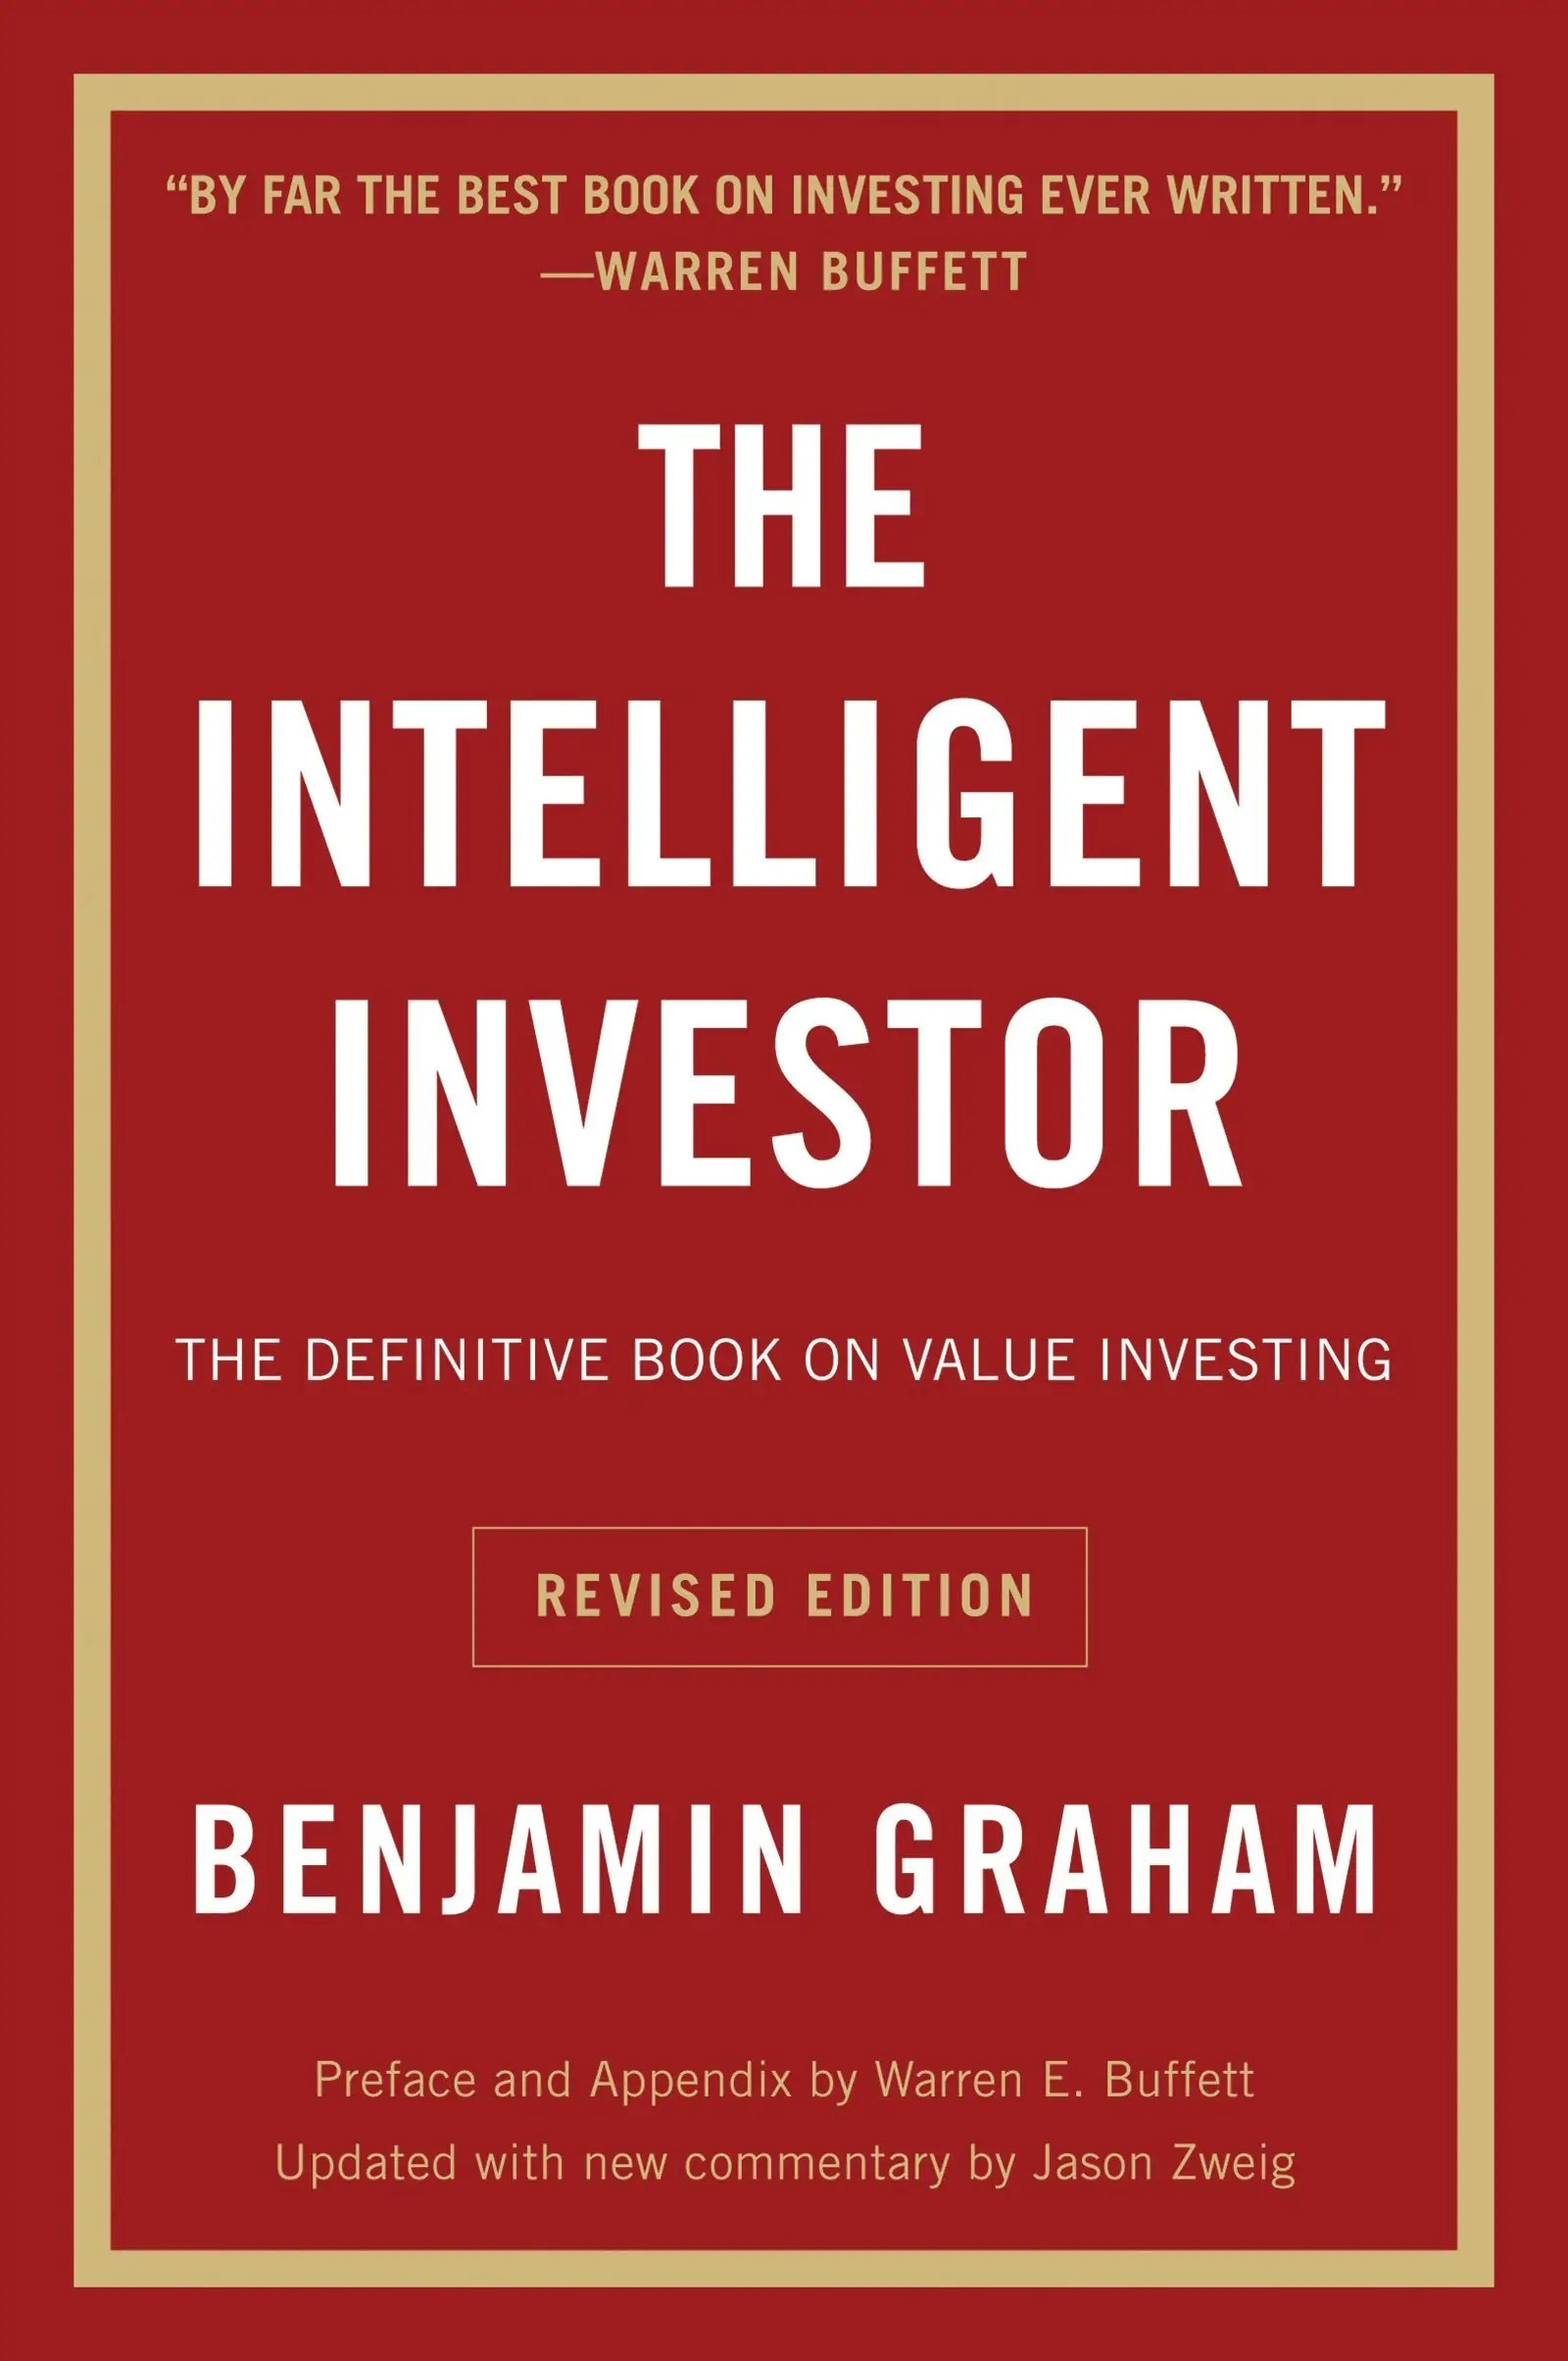 9 books billionaire warren buffett thinks everyone should read rh business financialpost com warren buffett books amazon warren buffett books free